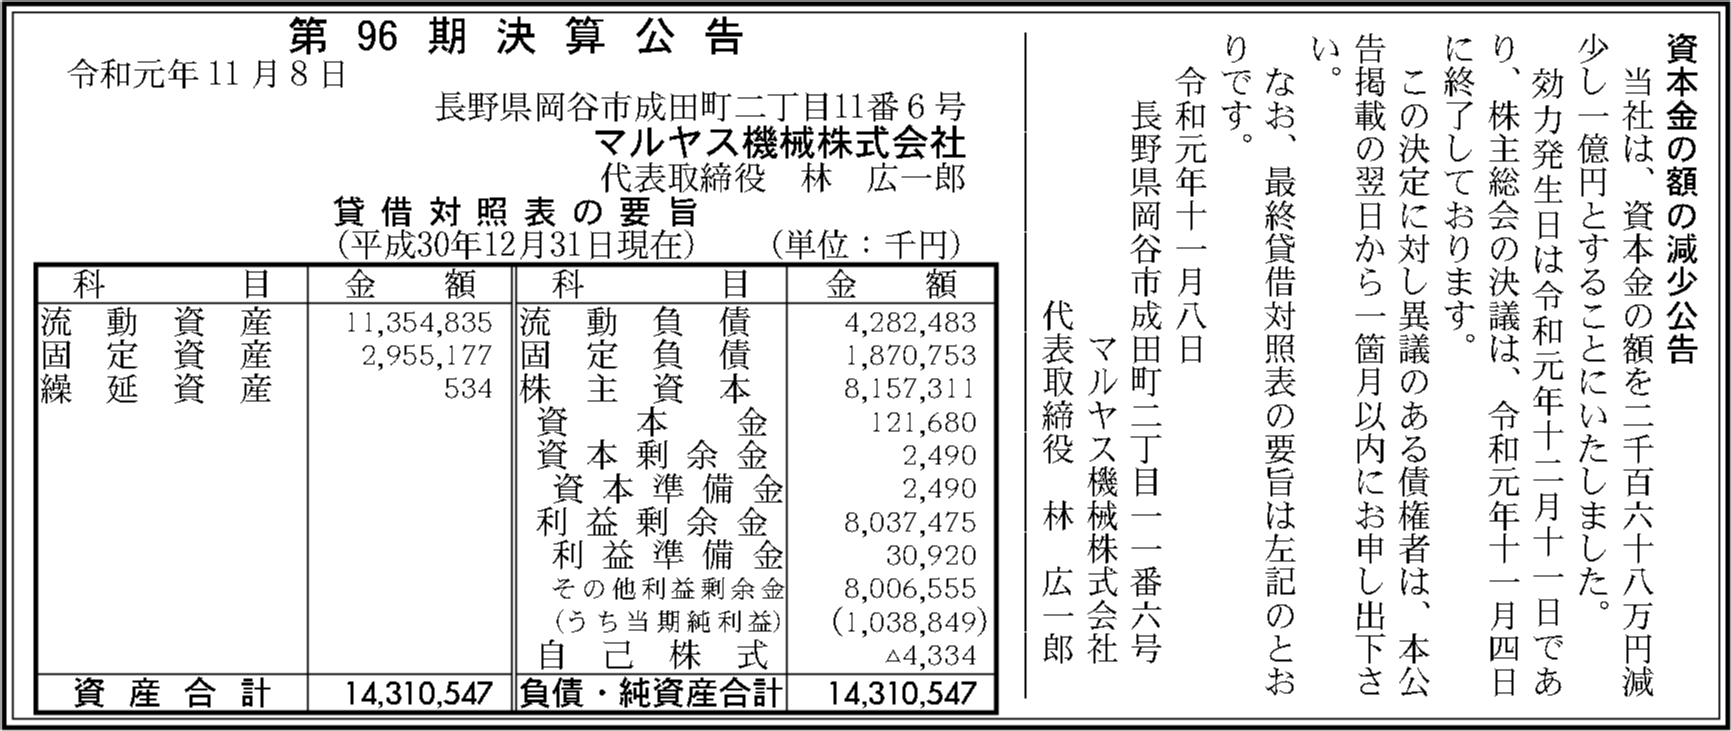 0127 2e490fe3a56b3c0ea9f6eca3bb6092af1e3fd9479ccf257fdb56d5c75da2e731aa7b62db26461fd09a702c09c48d8b0cc5bb64326f5e5f57e164ba86ac8c930d 02